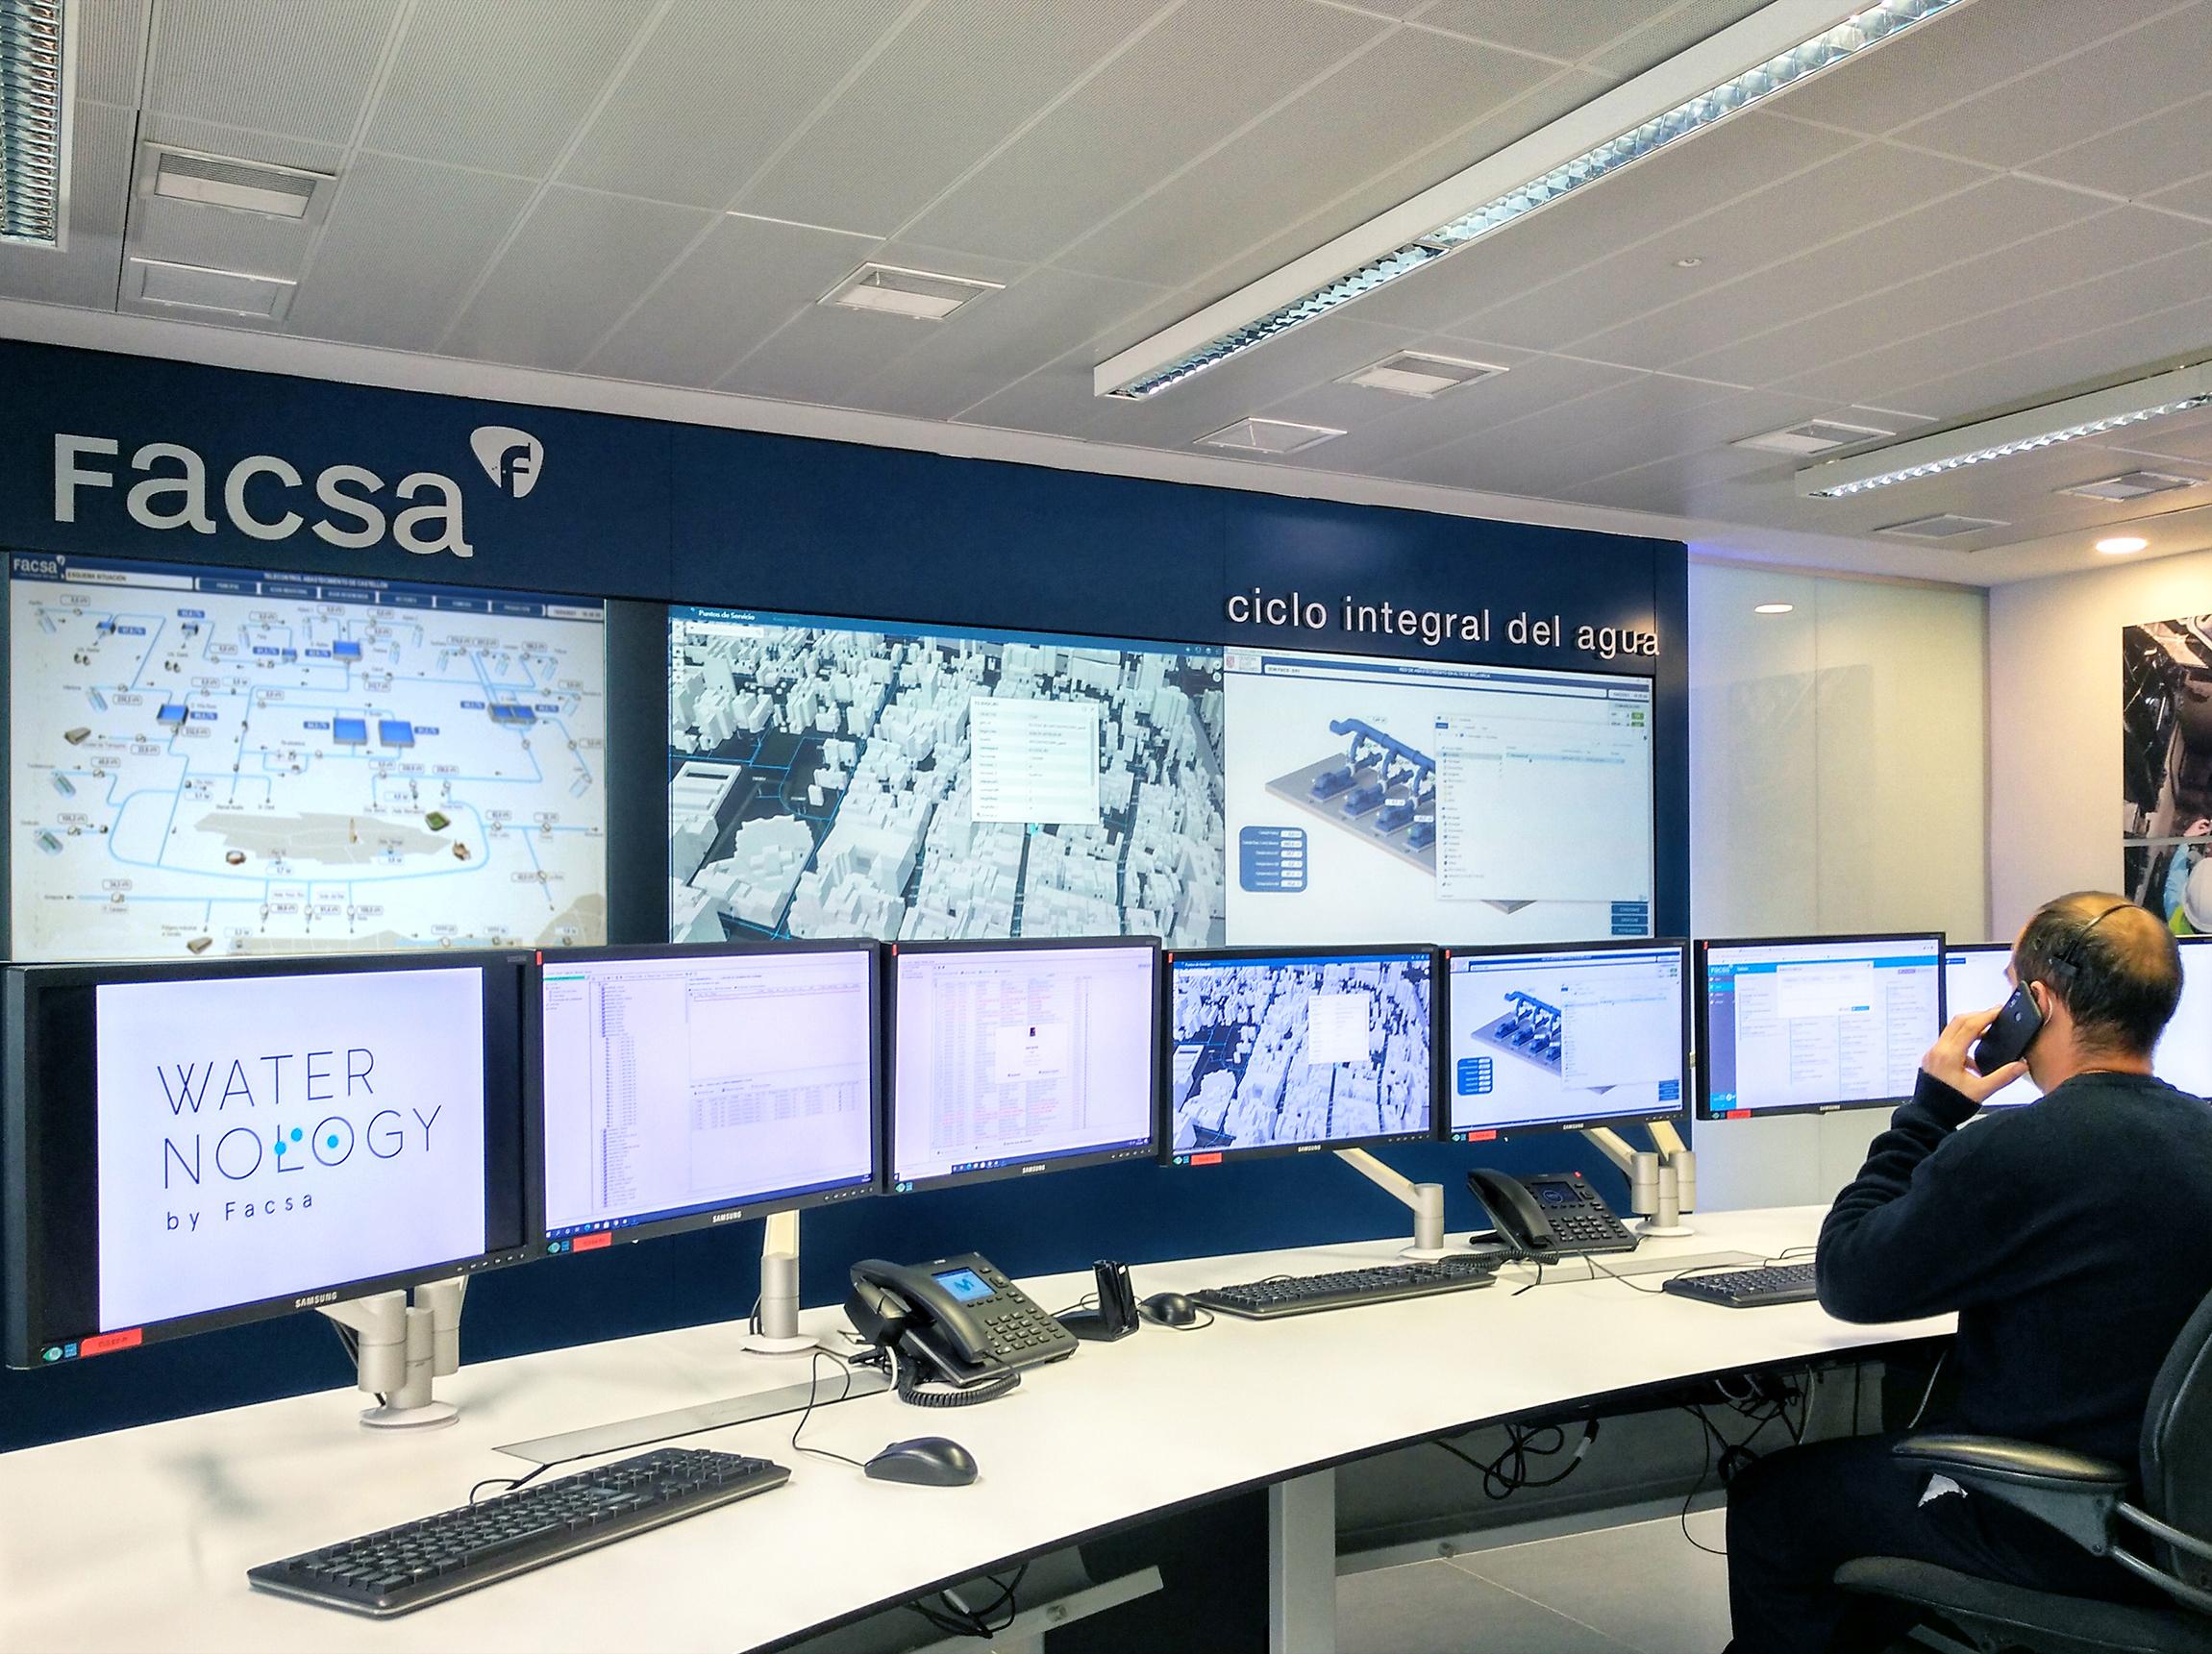 Centro de control_Waternology_